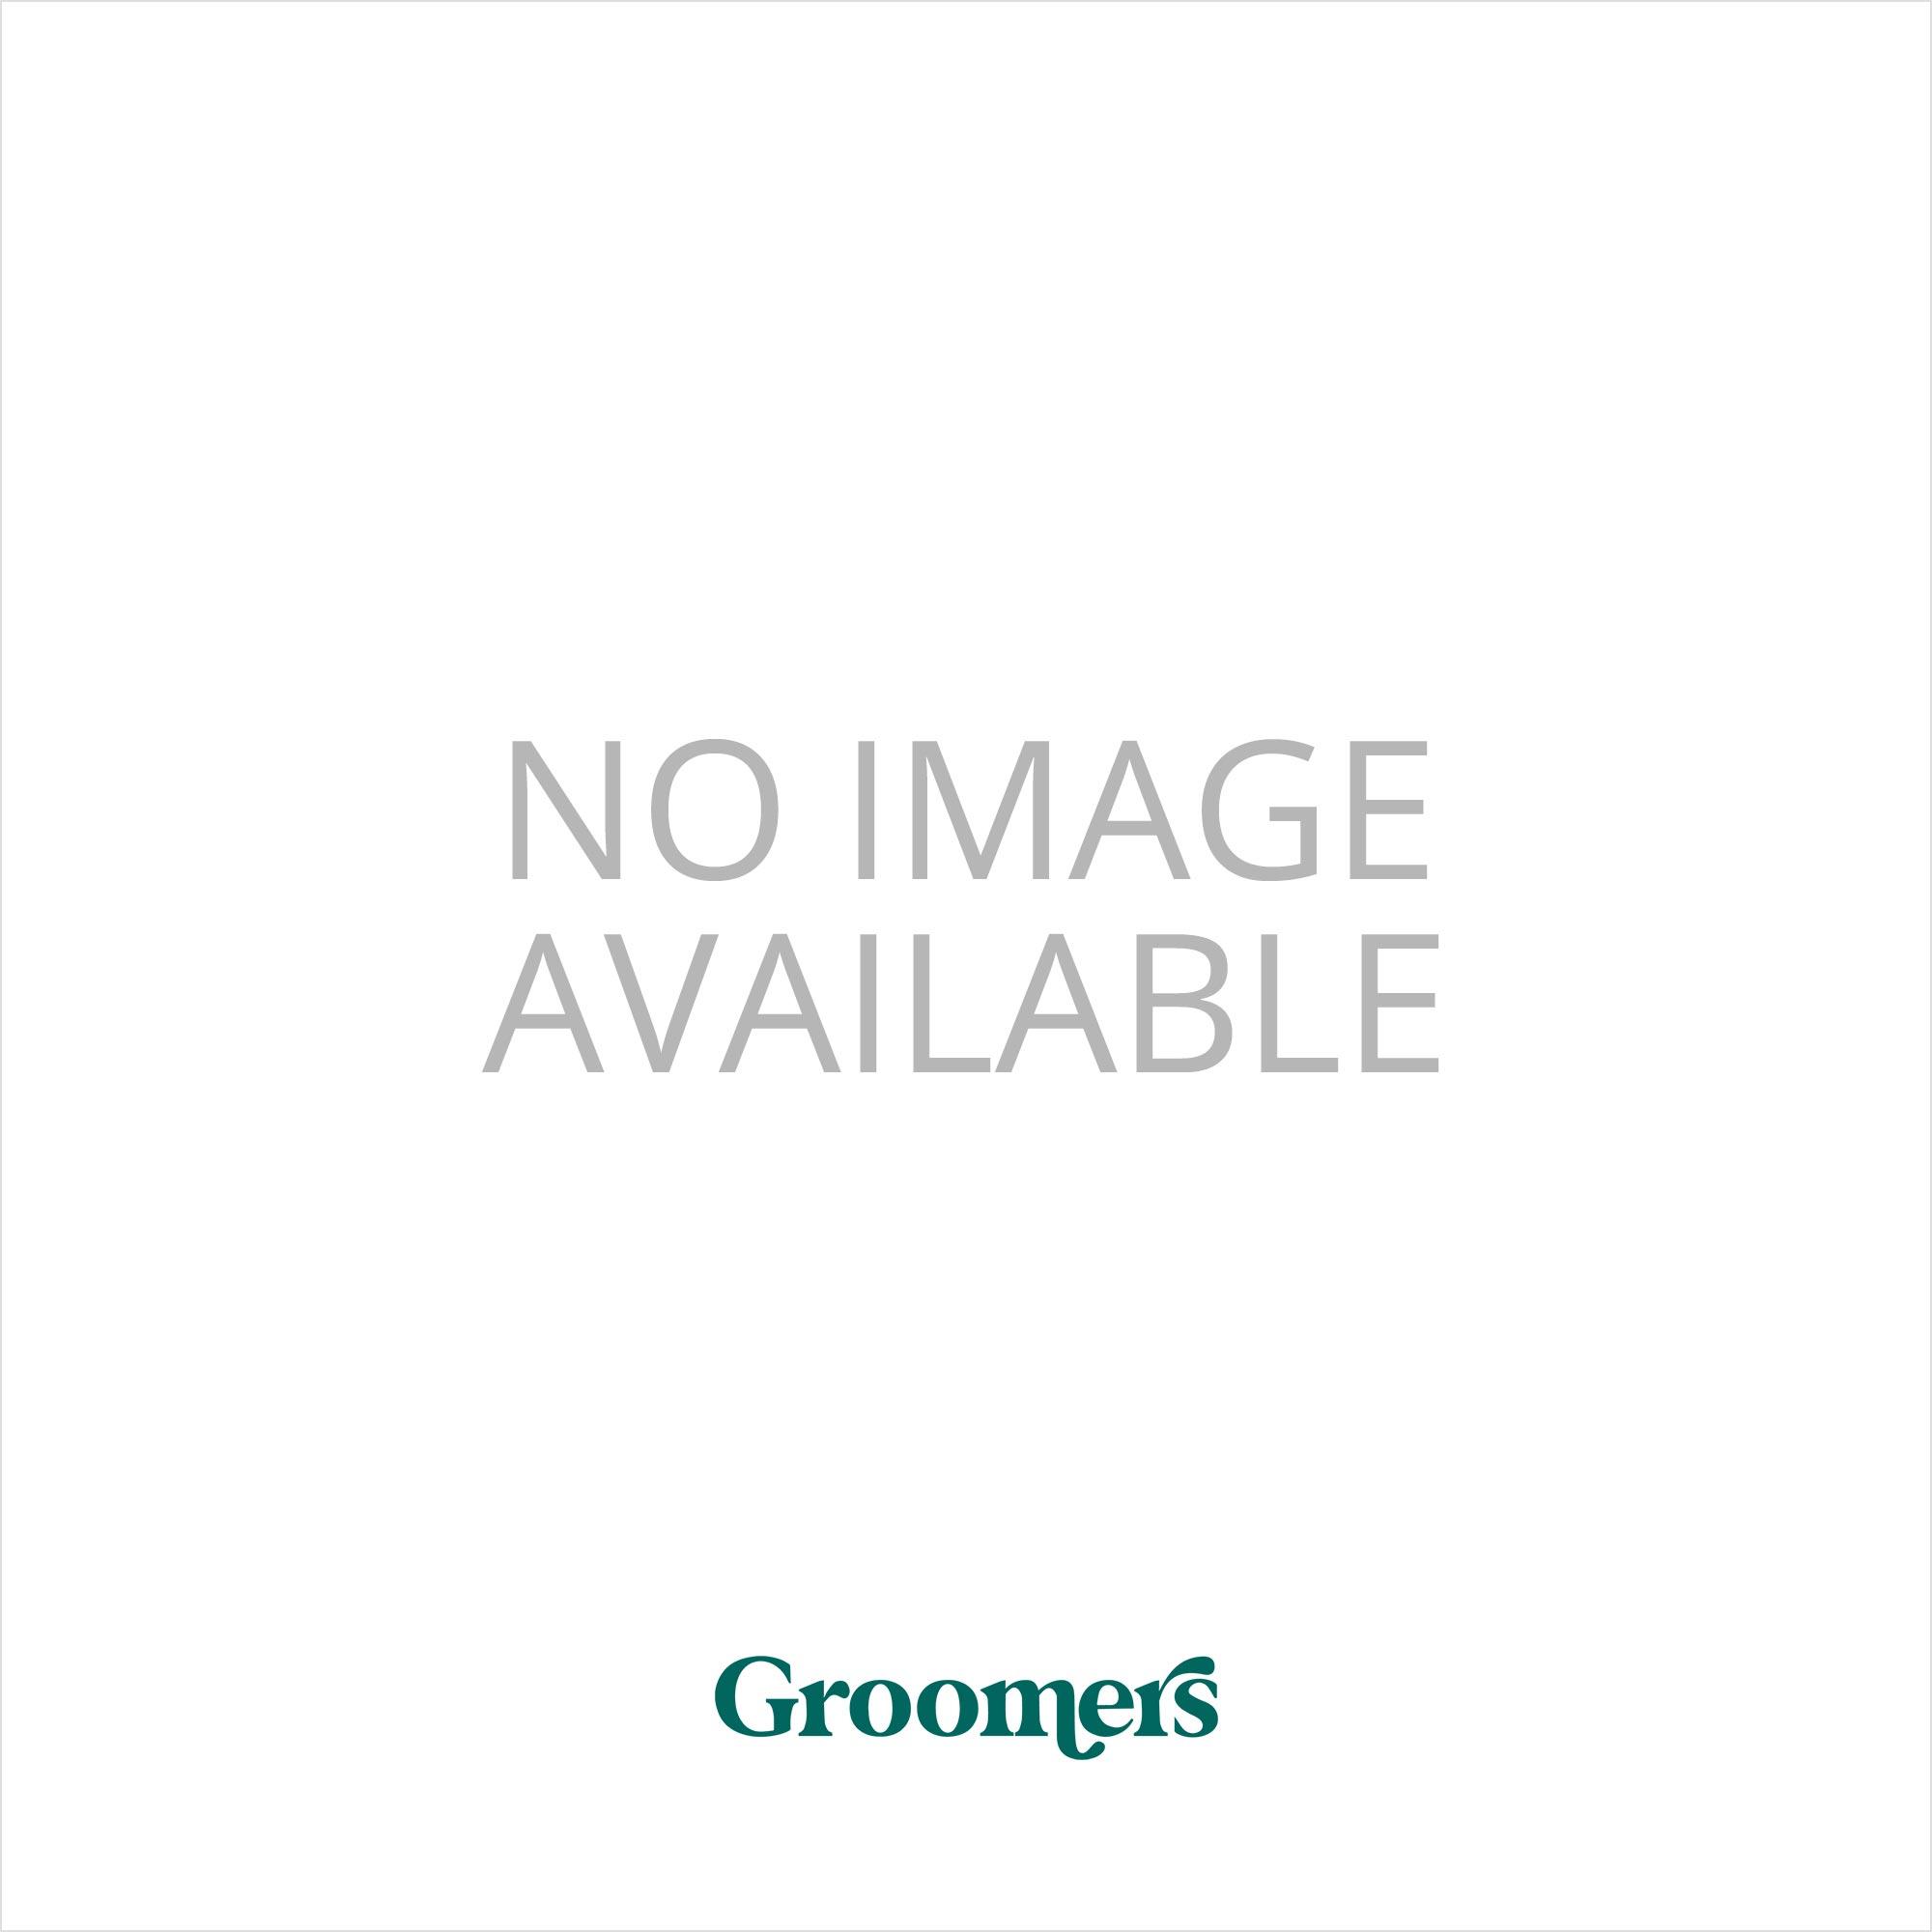 Groomers EPO Coat Conditioning Spray - Retail Size (250ml)